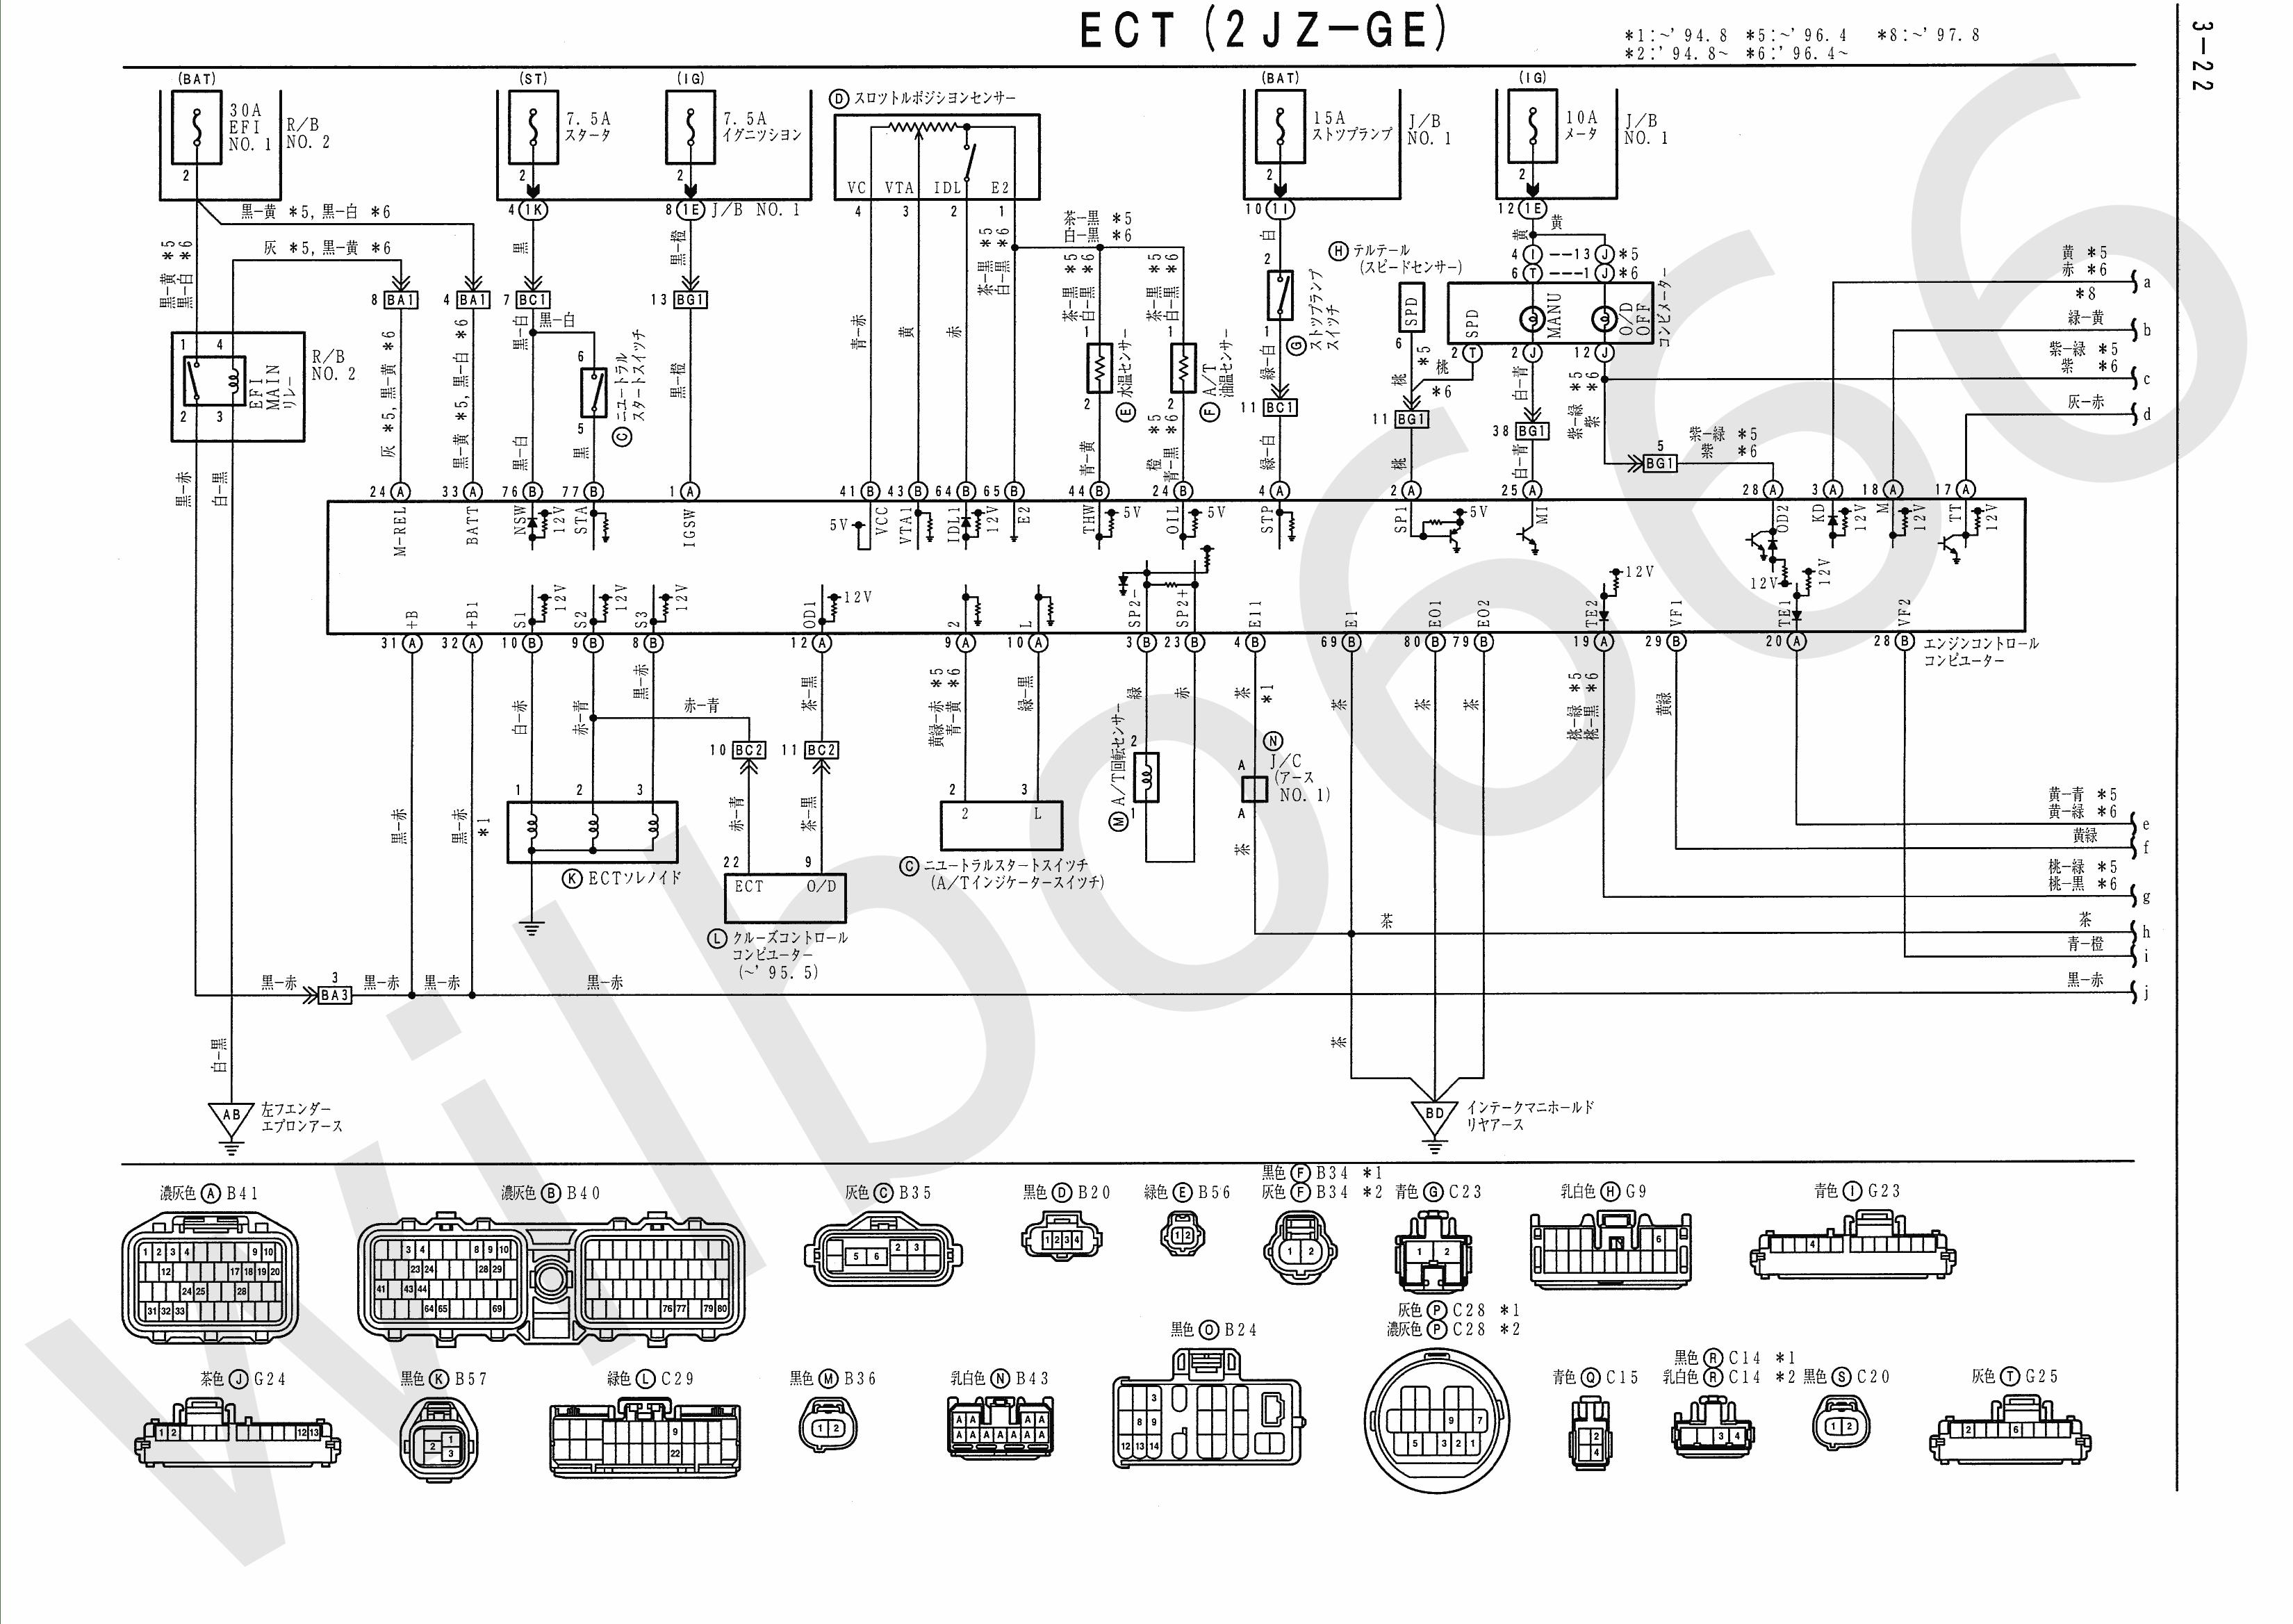 Eo 8244 2jz Ge Engine Diagram Wiring Diagram